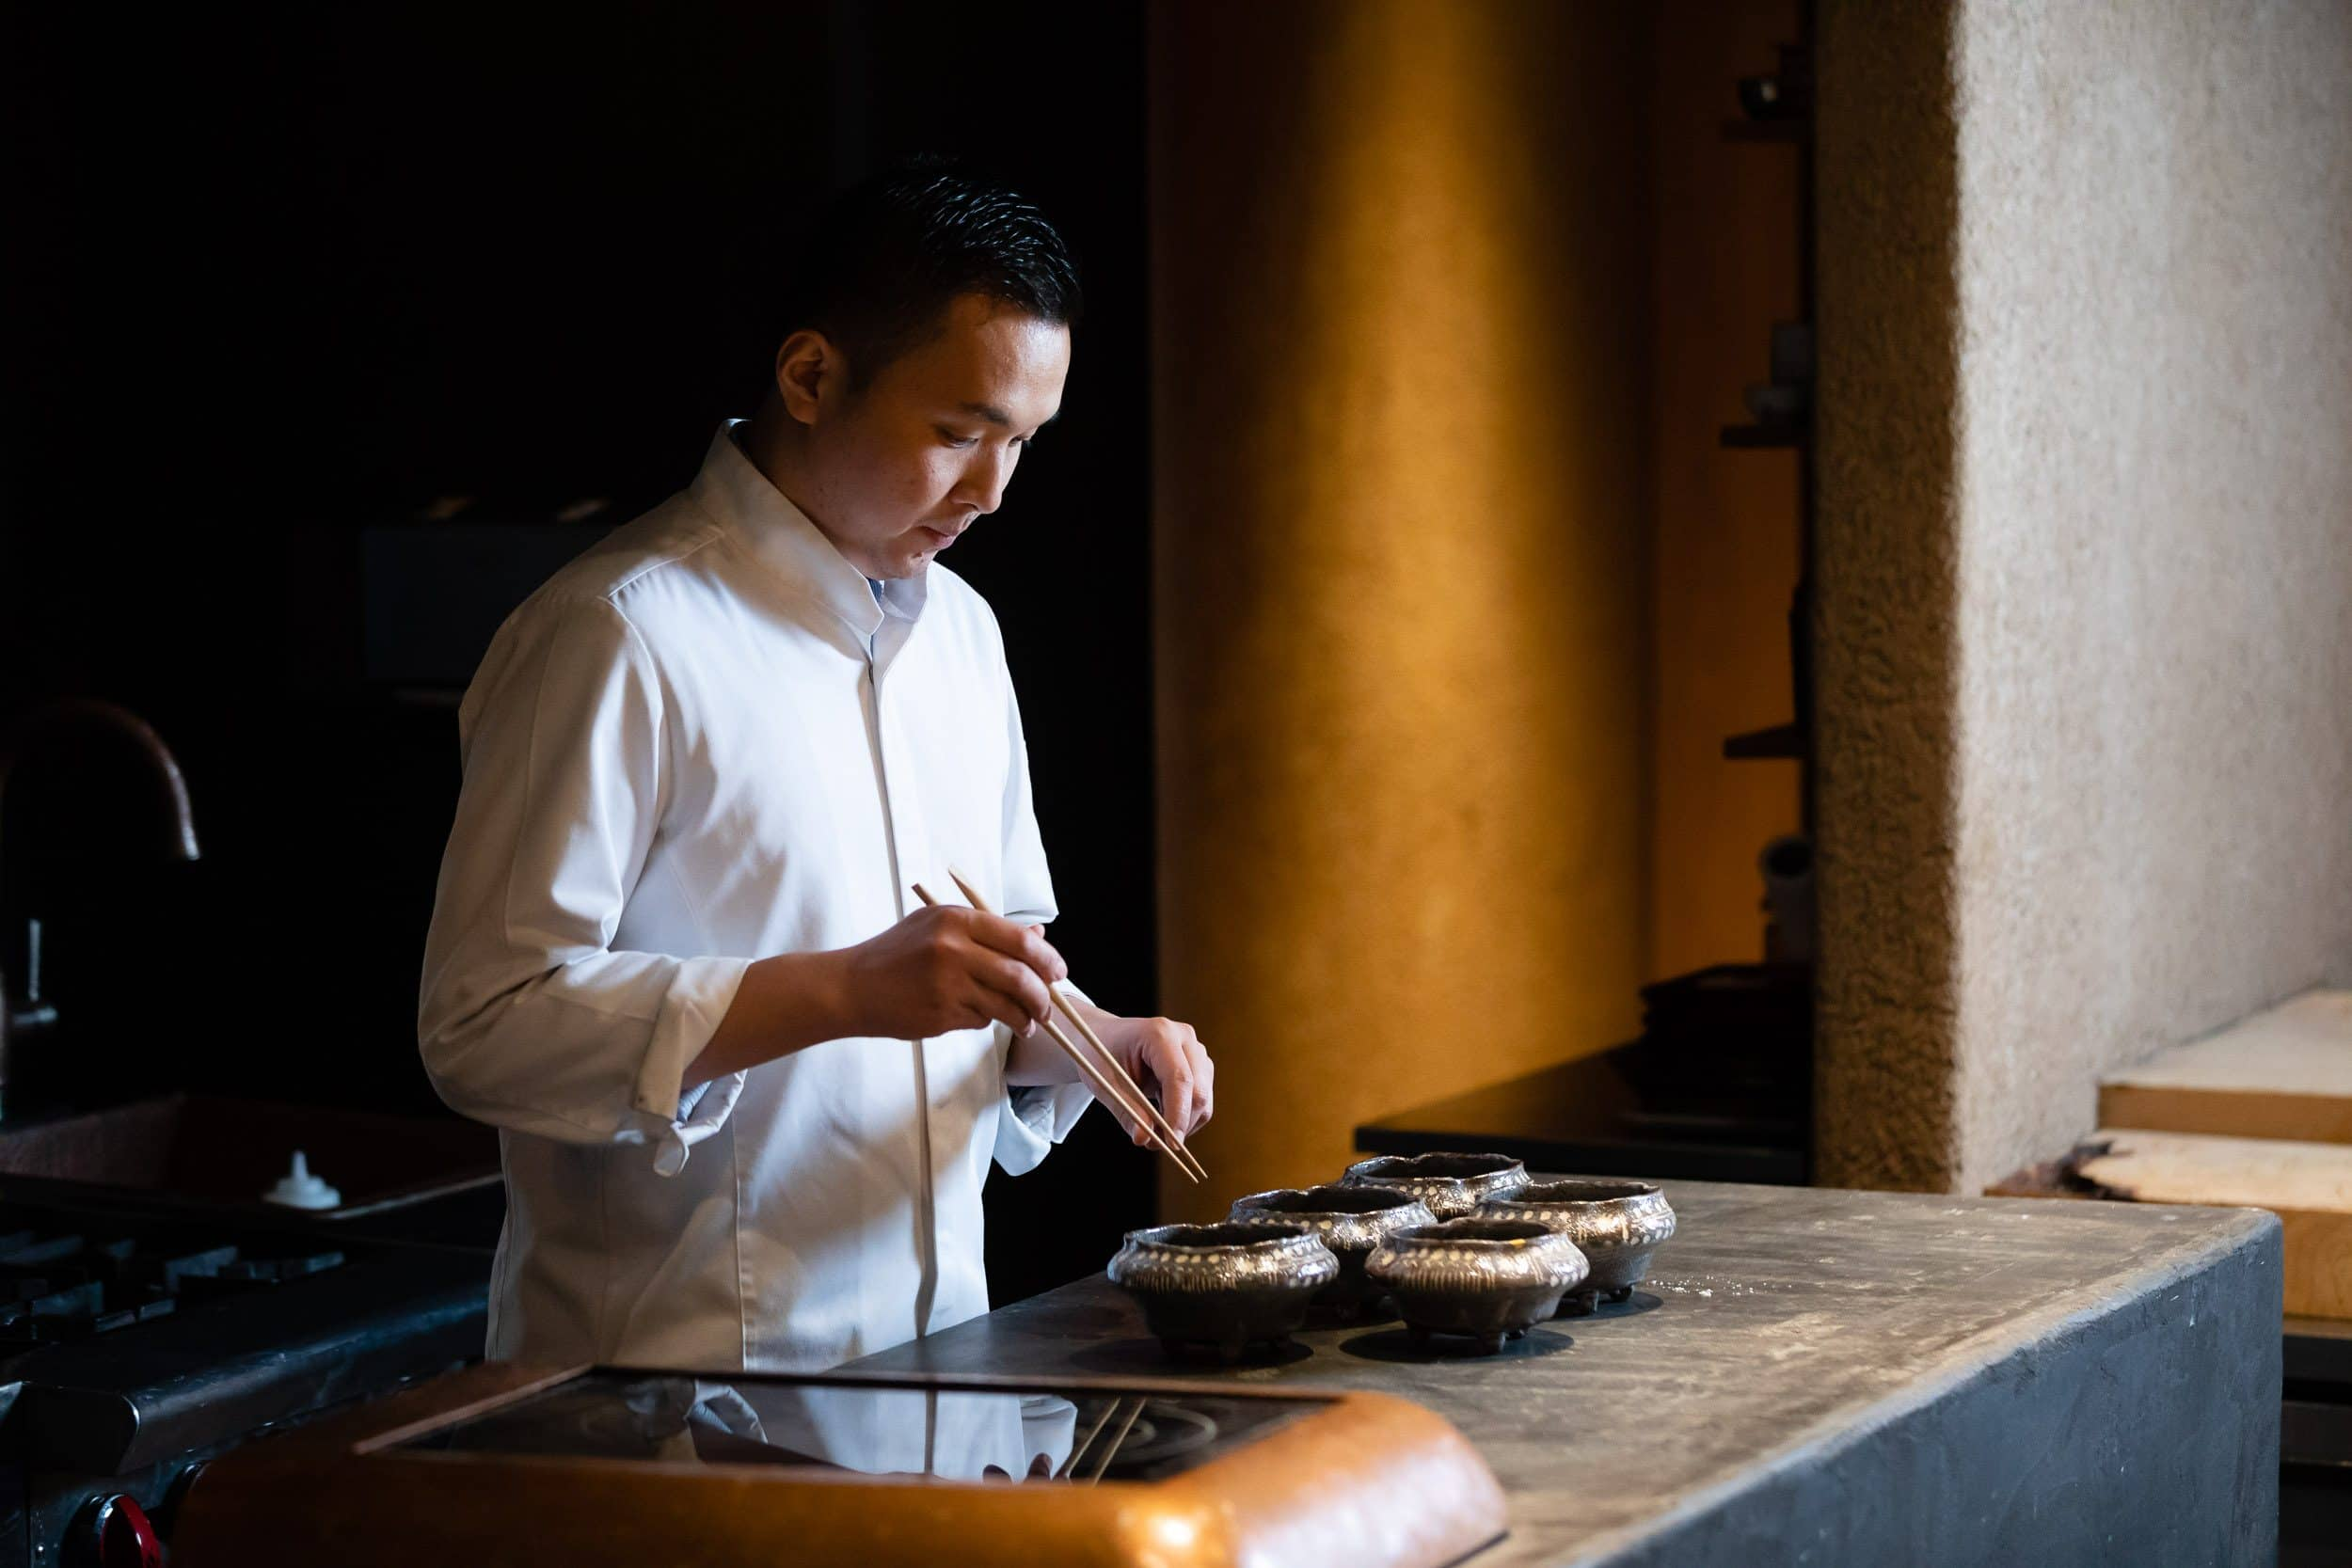 Chef prepares food at Odo